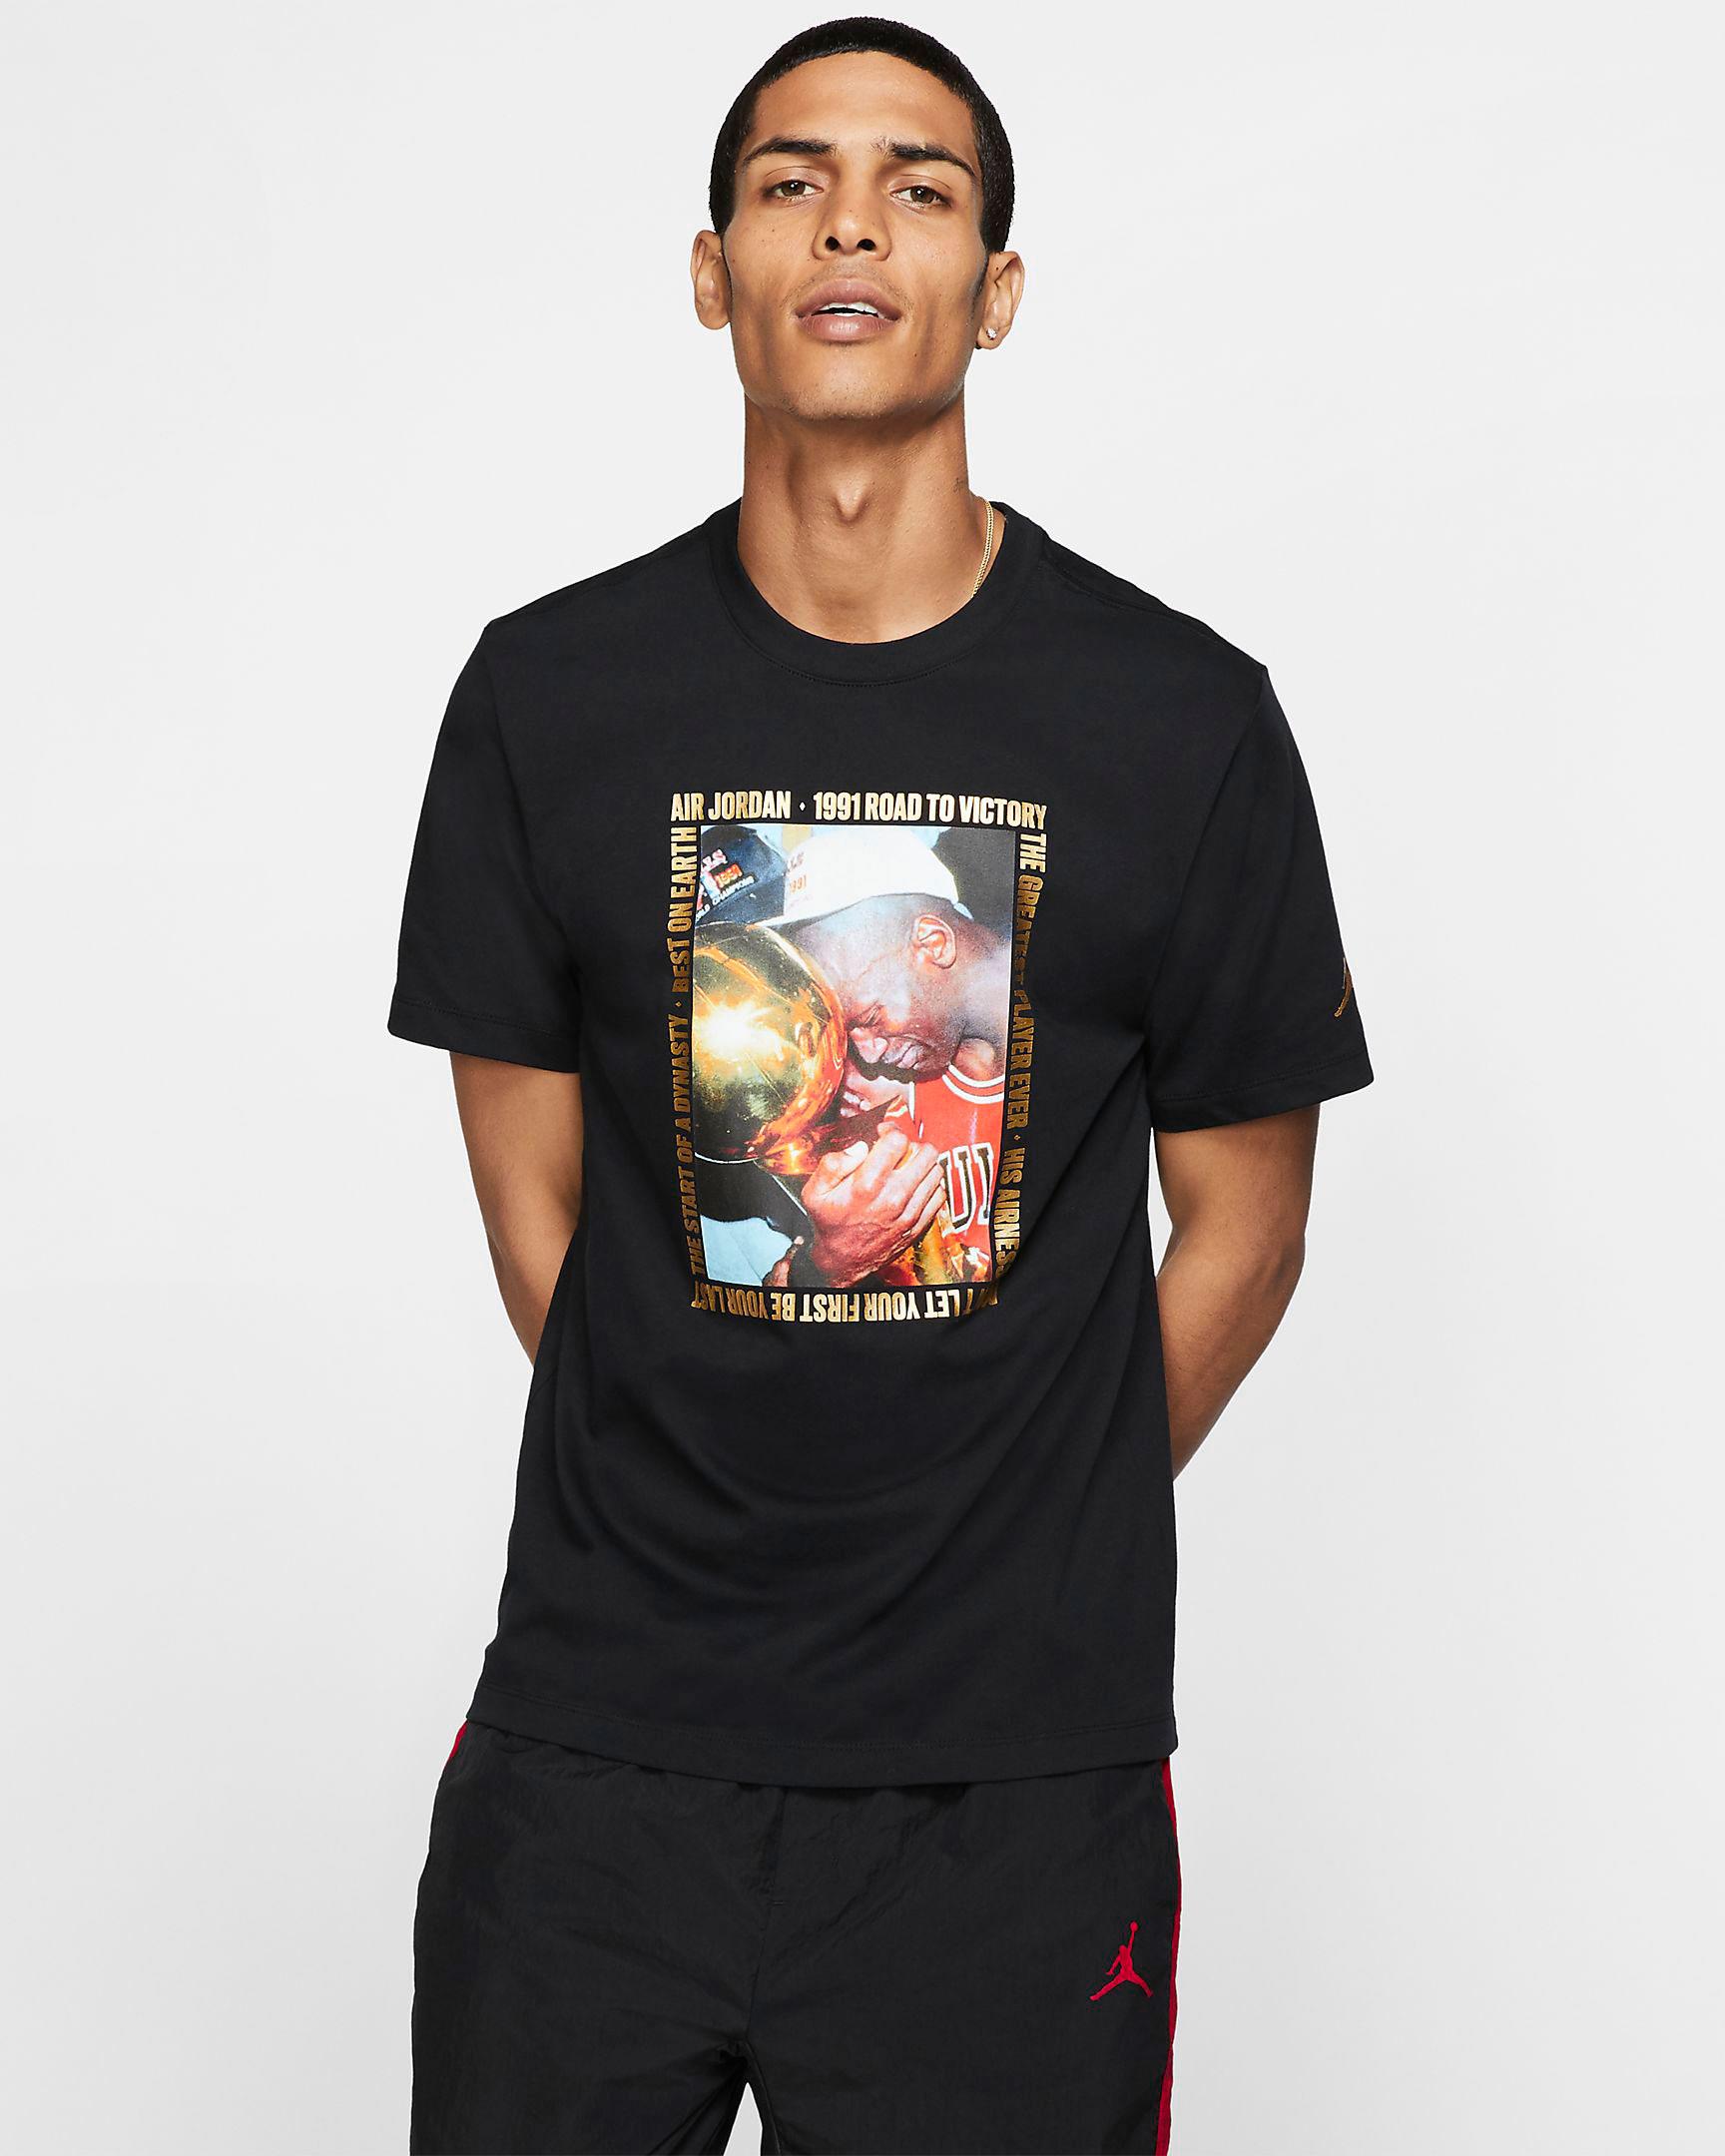 jordan-7-reflections-of-a-champion-shirt-3